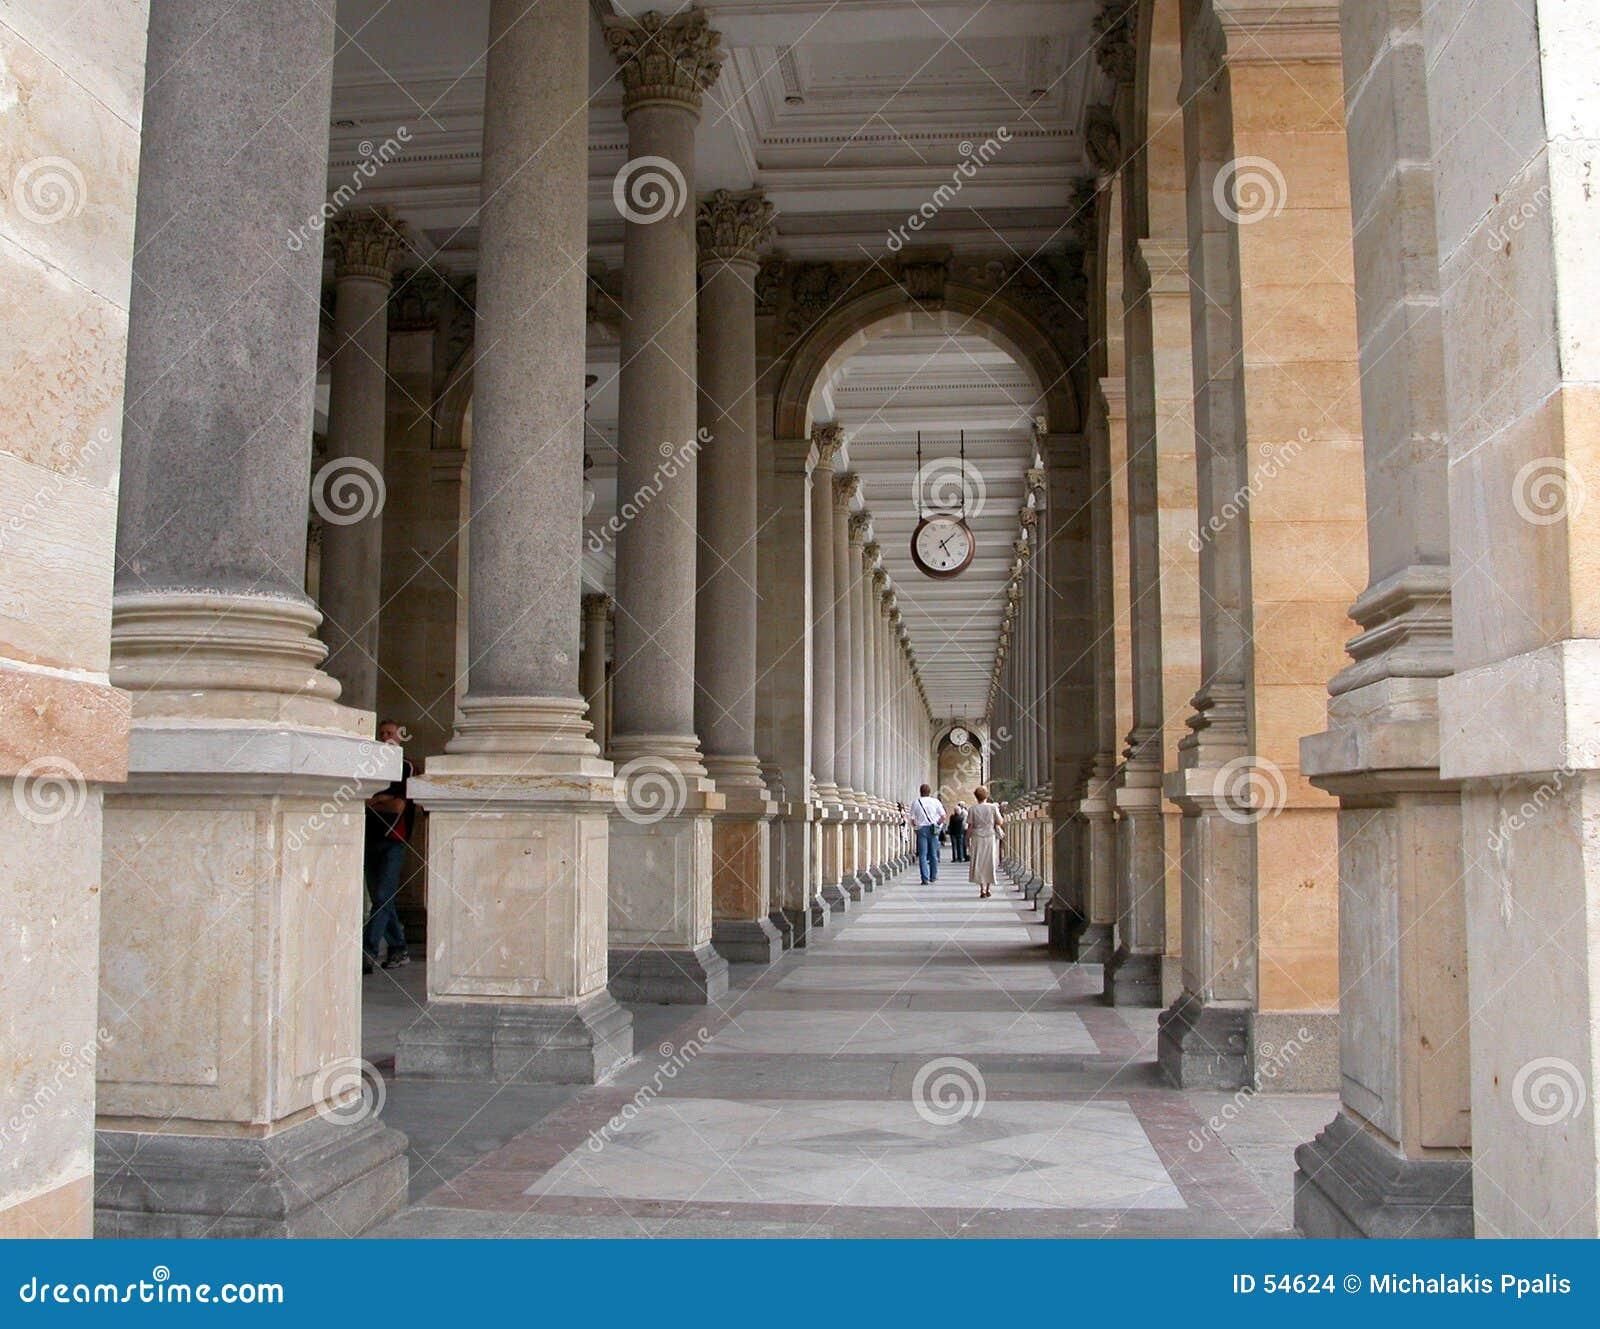 Columnas y pilares